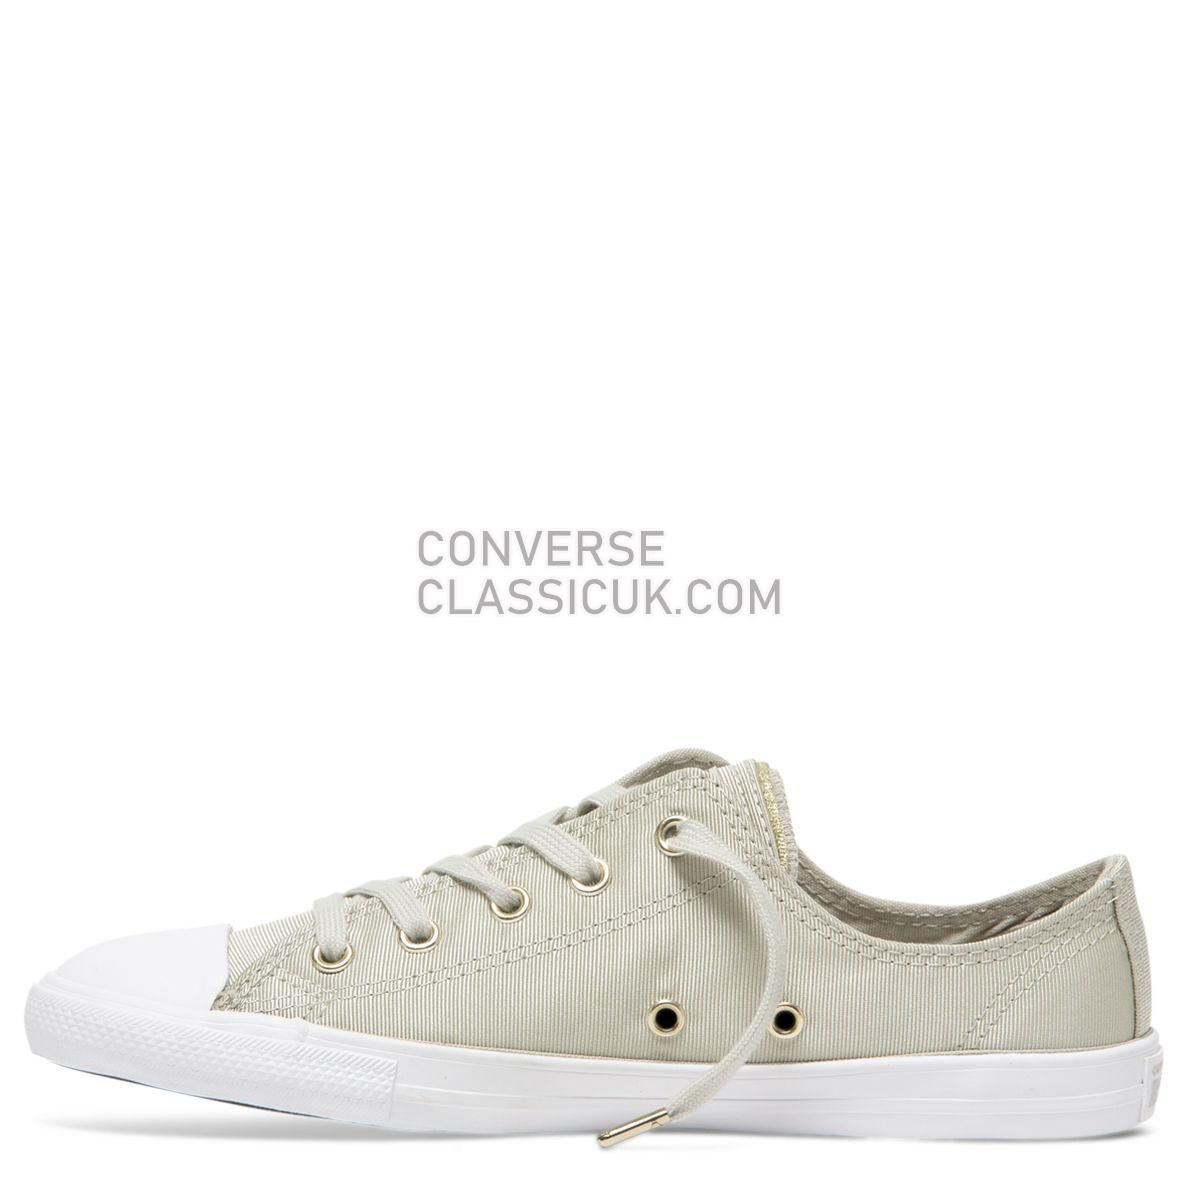 Converse Chuck Taylor All Star Dainty Summer Palms Low Top Light Surplus Womens 564307 Light Surplus/Field Surplus/Light Gold Shoes